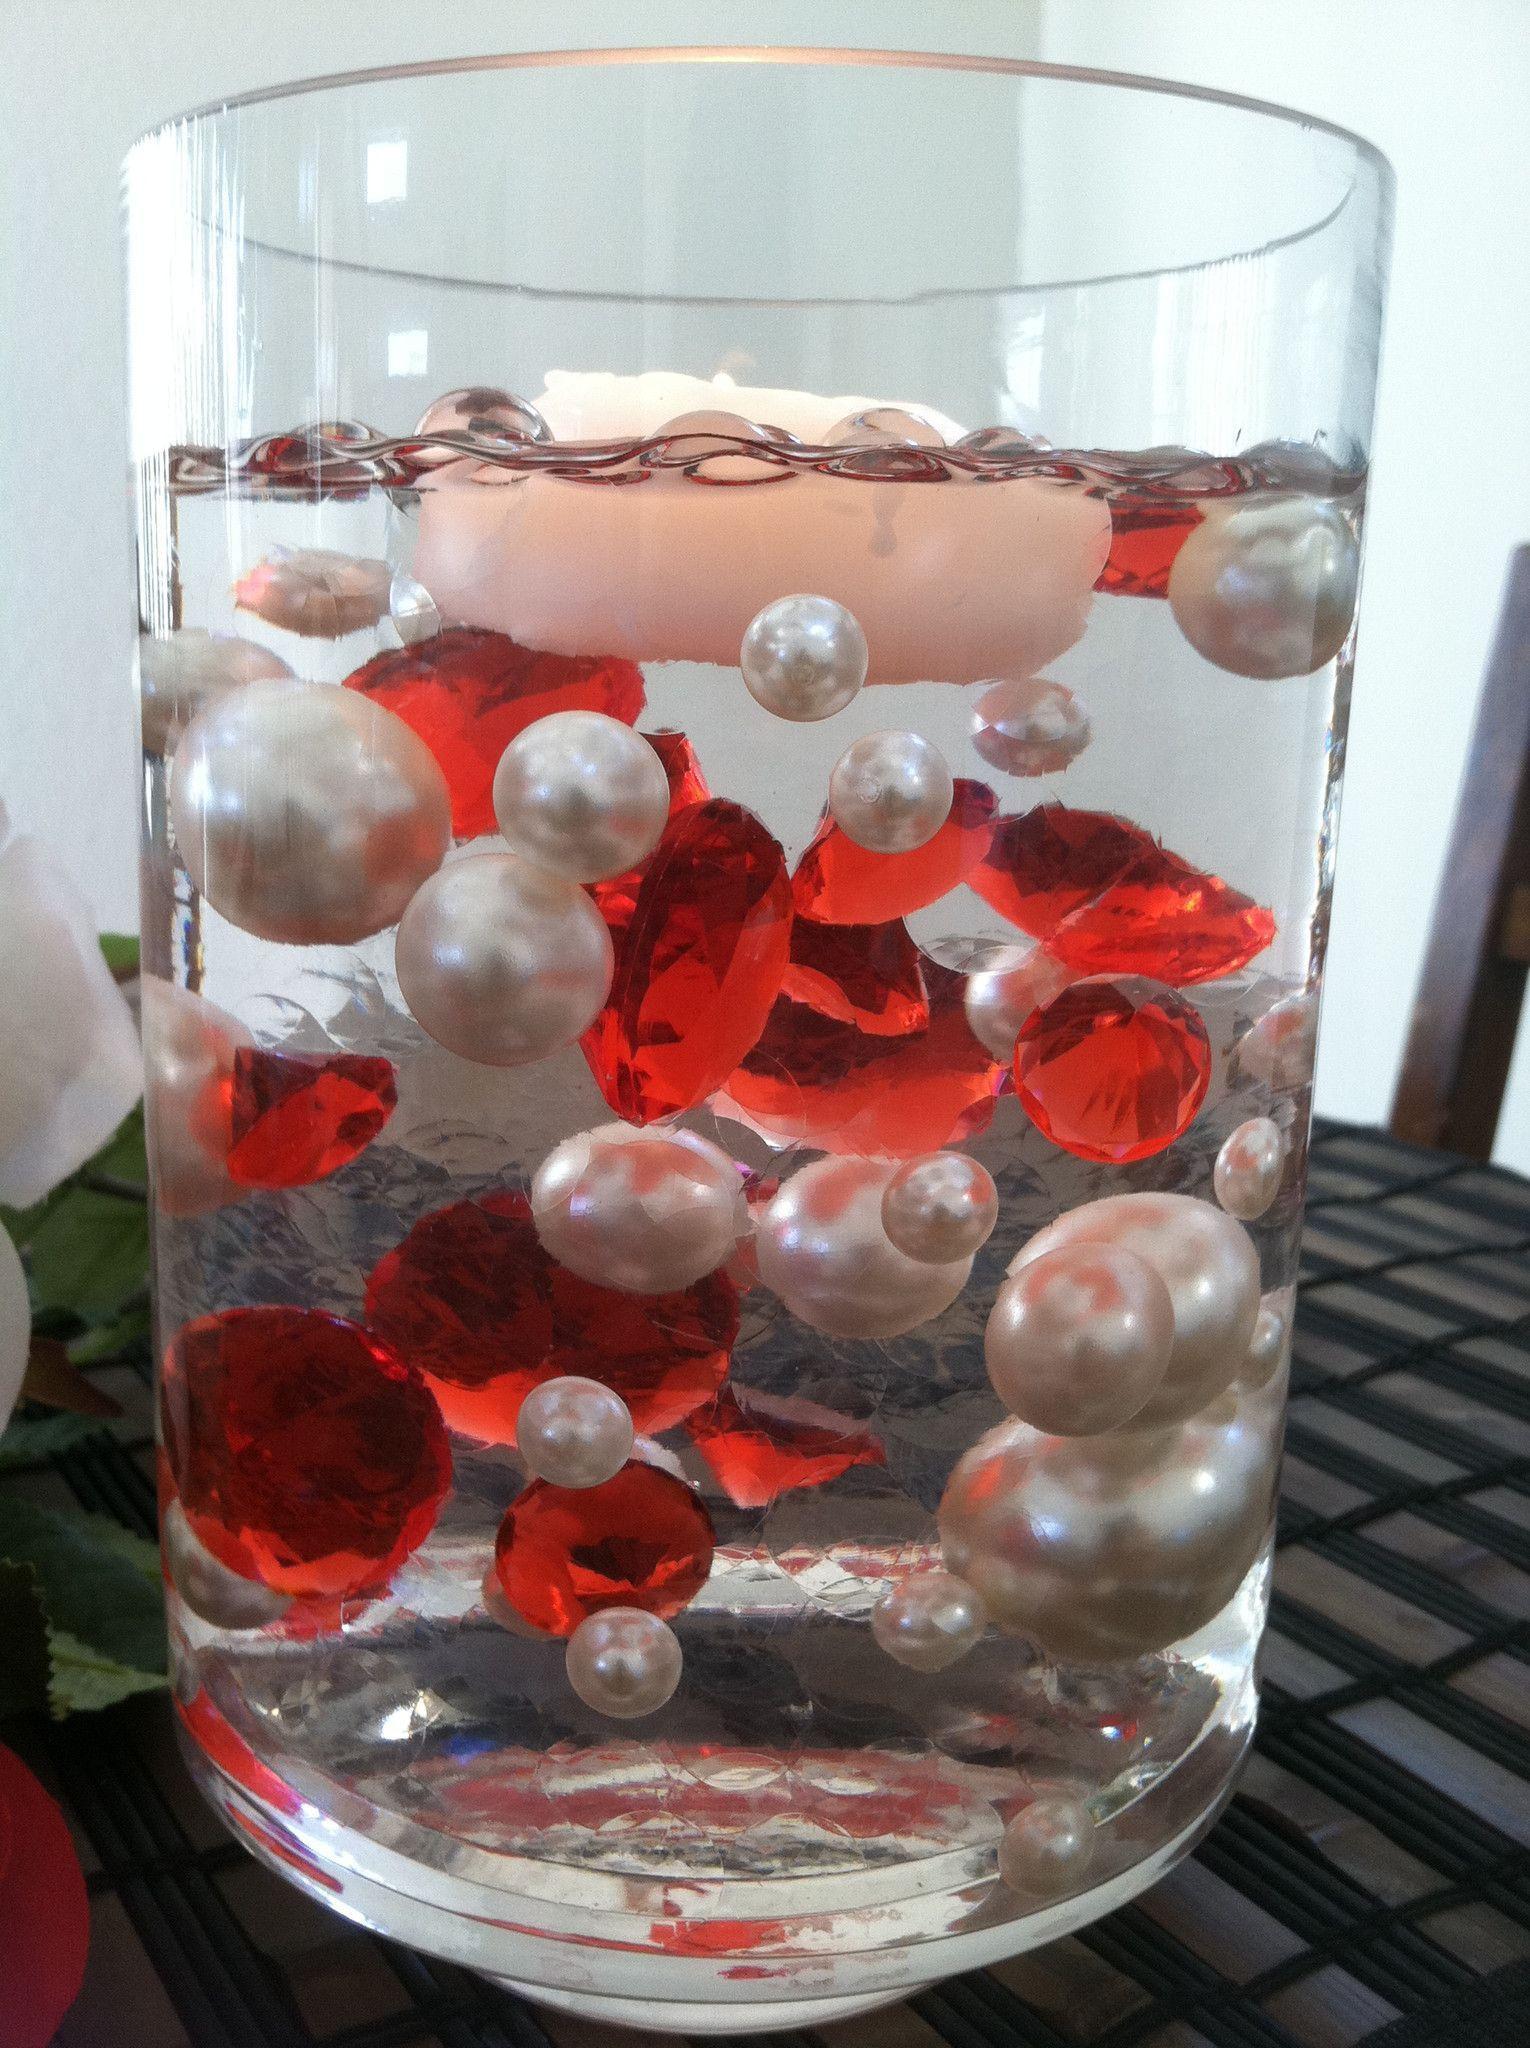 clear gem vase fillers of floating diamonds and pearl centerpiece vase filler gems table within floating diamonds and pearl centerpiece vase filler gems table scatters